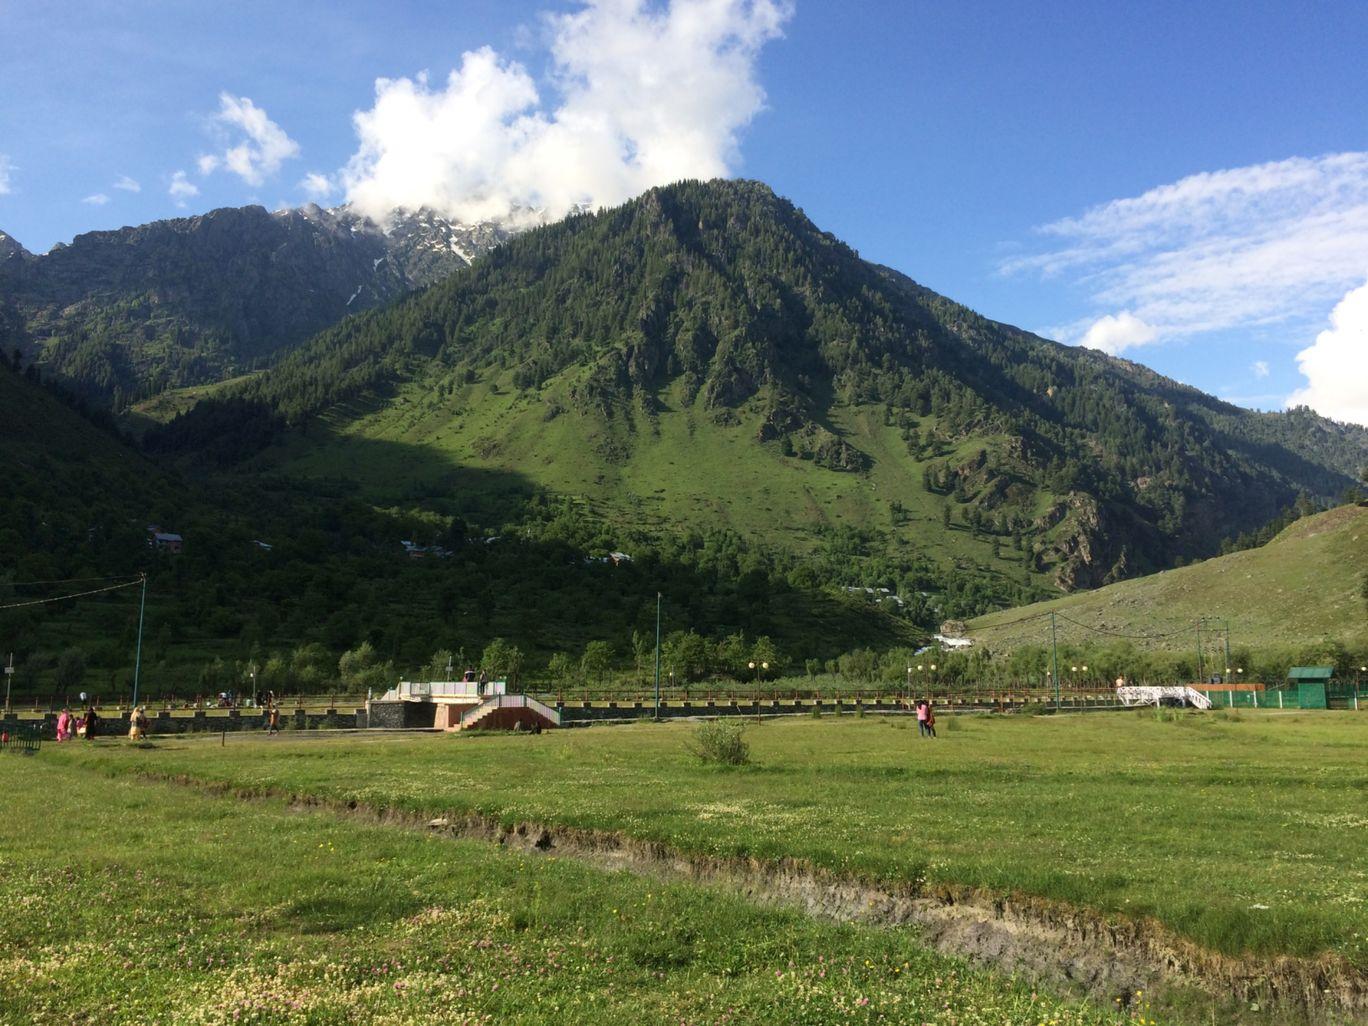 Photo of Betaab Valley By Shailesh Shende